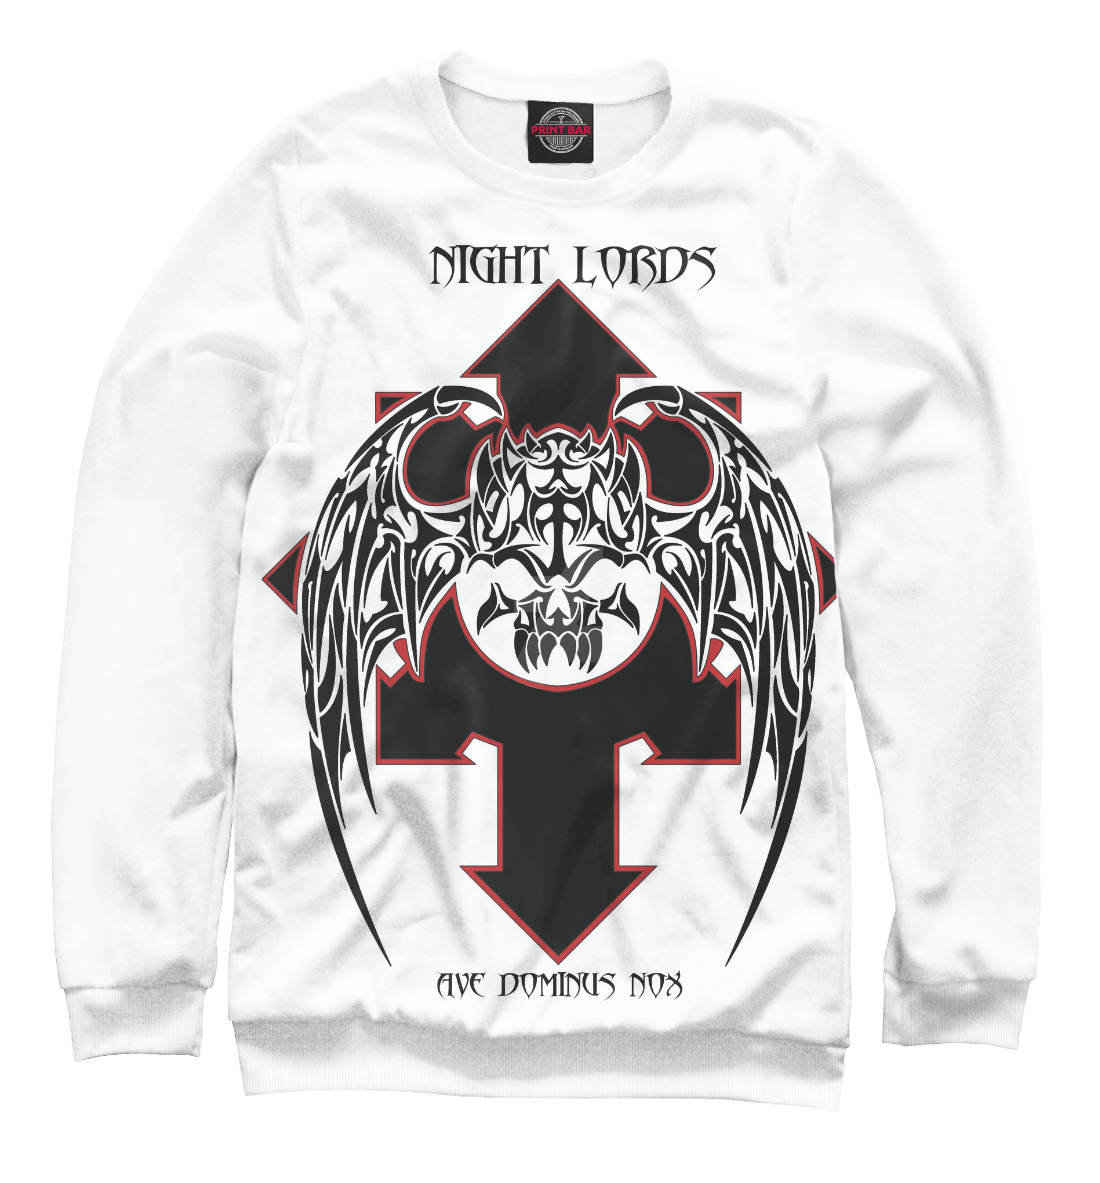 Купить Символ Повелителей Ночи, Printbar, Свитшоты, WHR-535954-swi-1